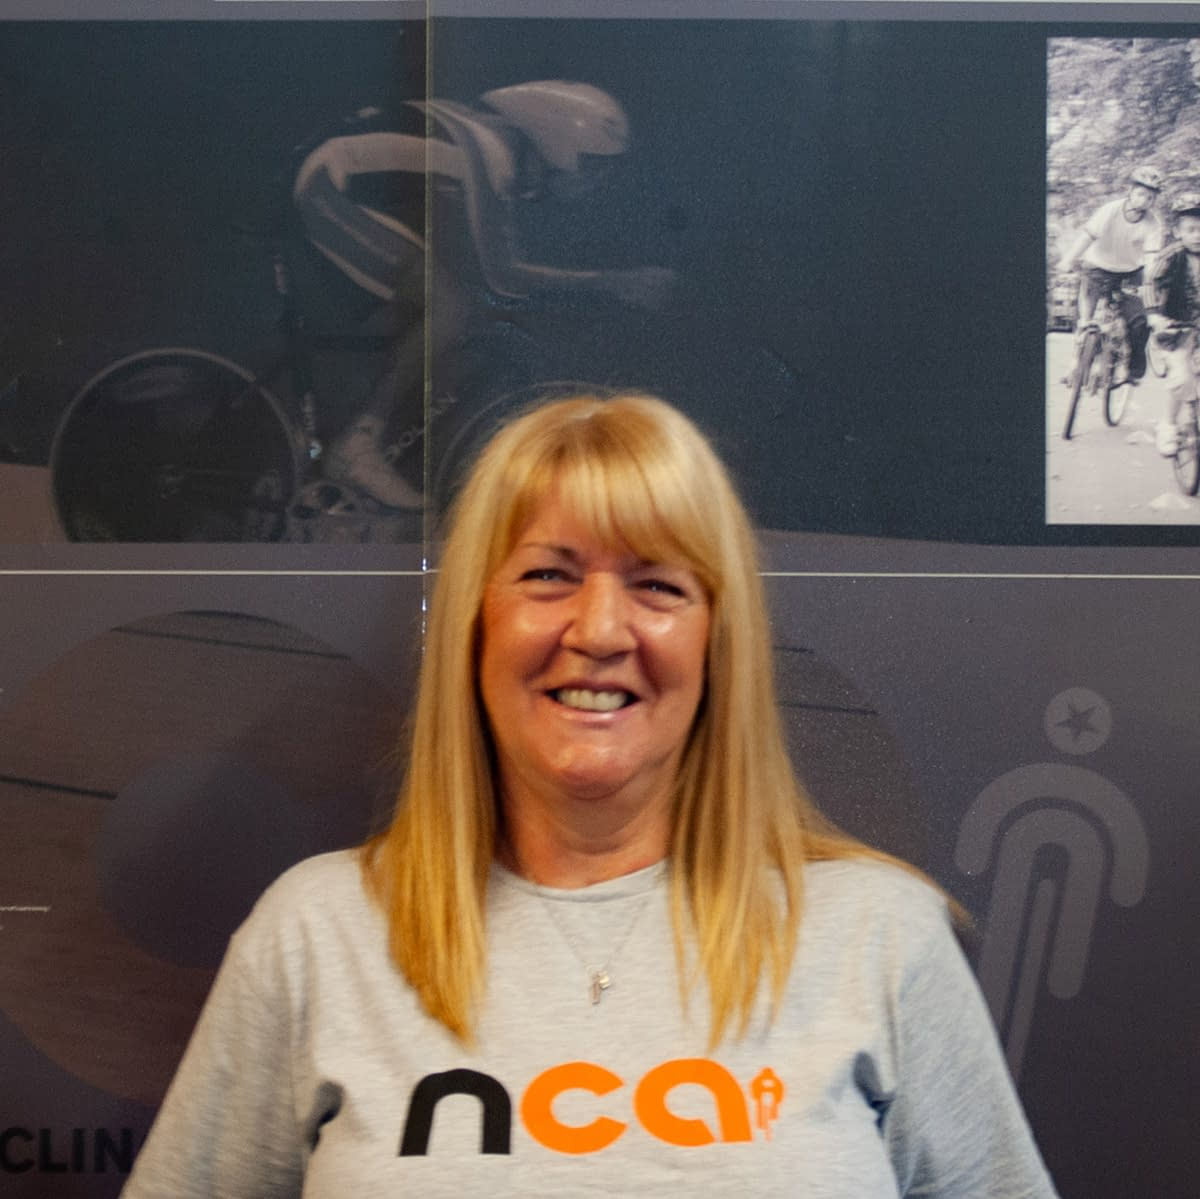 About NCA - Susan Williamson